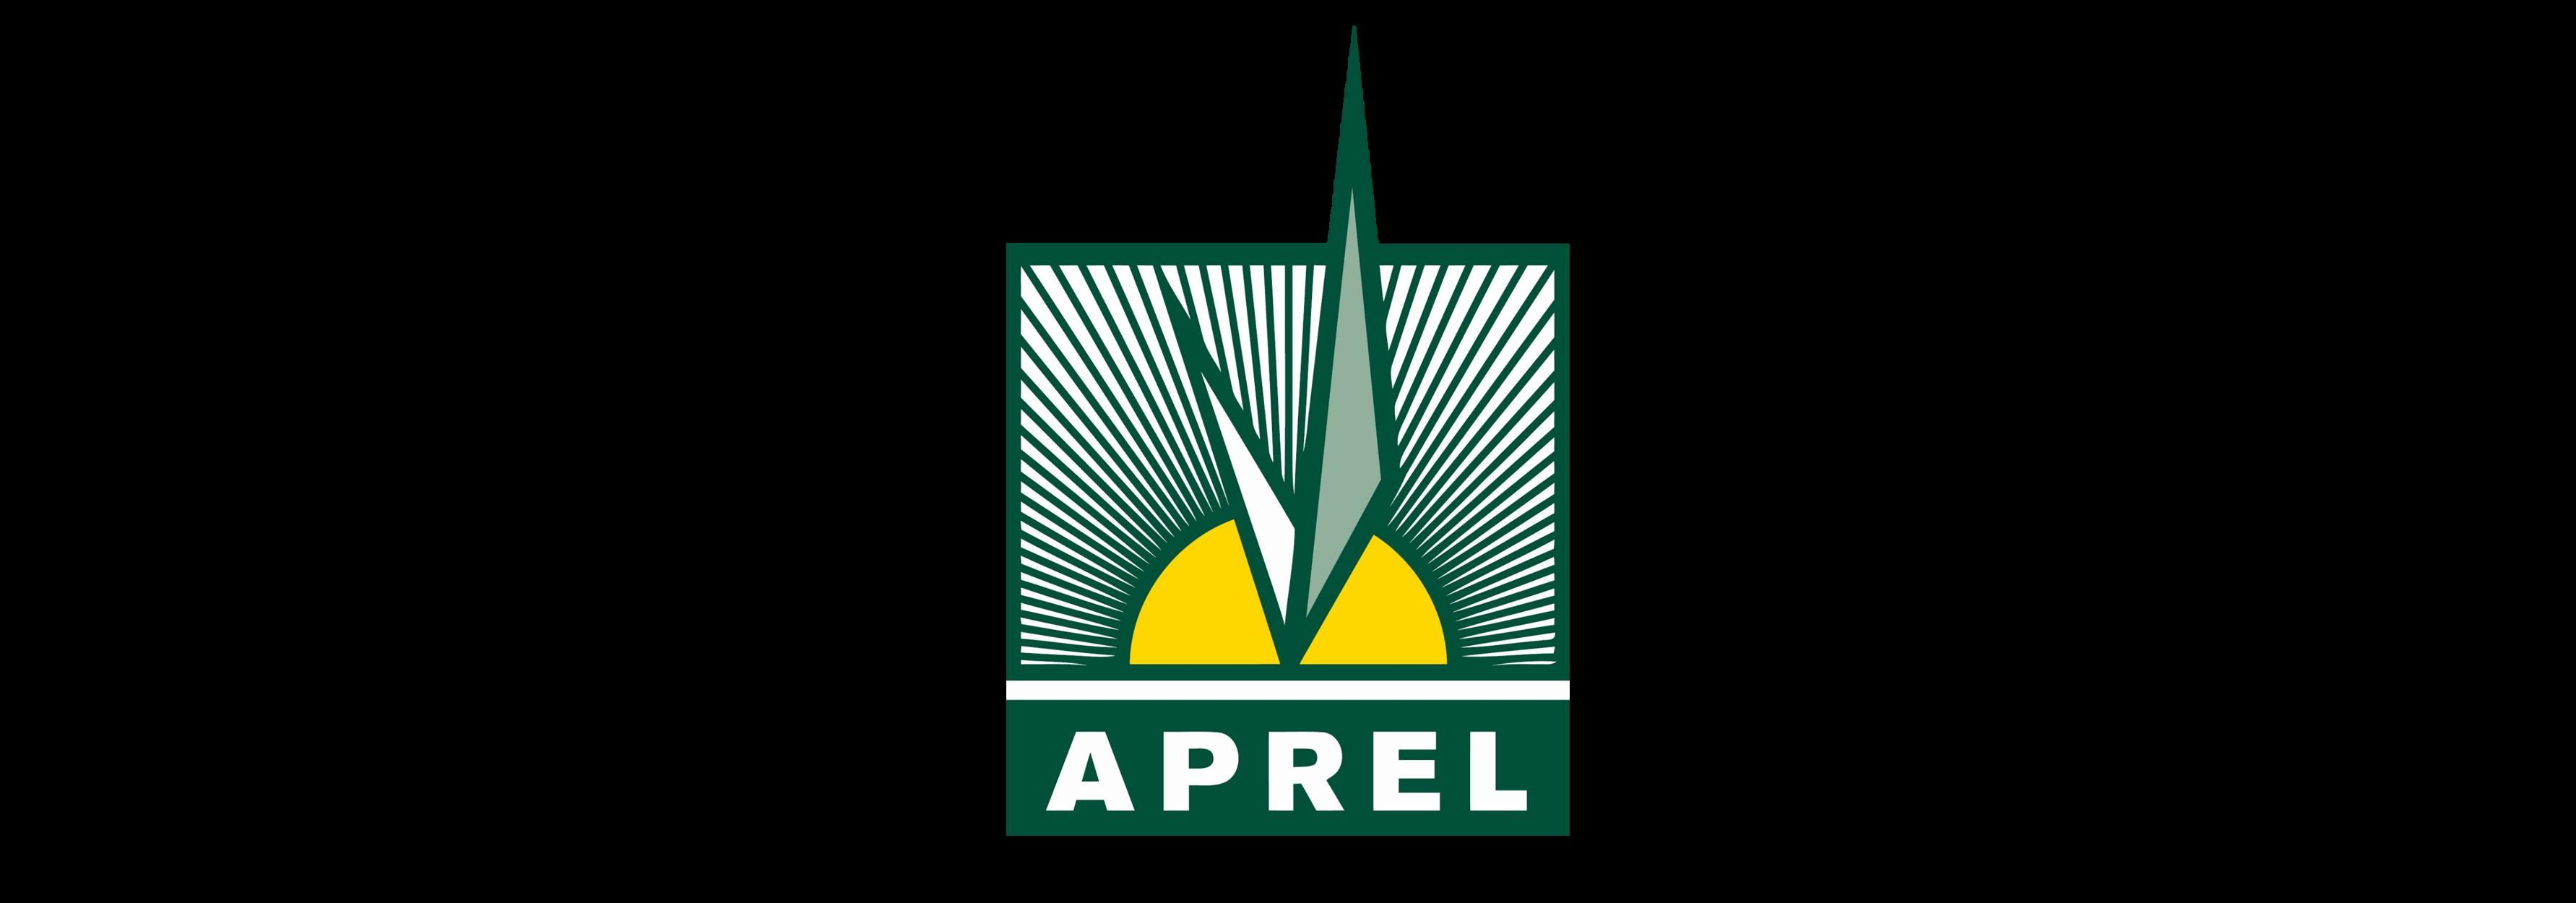 APREL Logo Demi transp